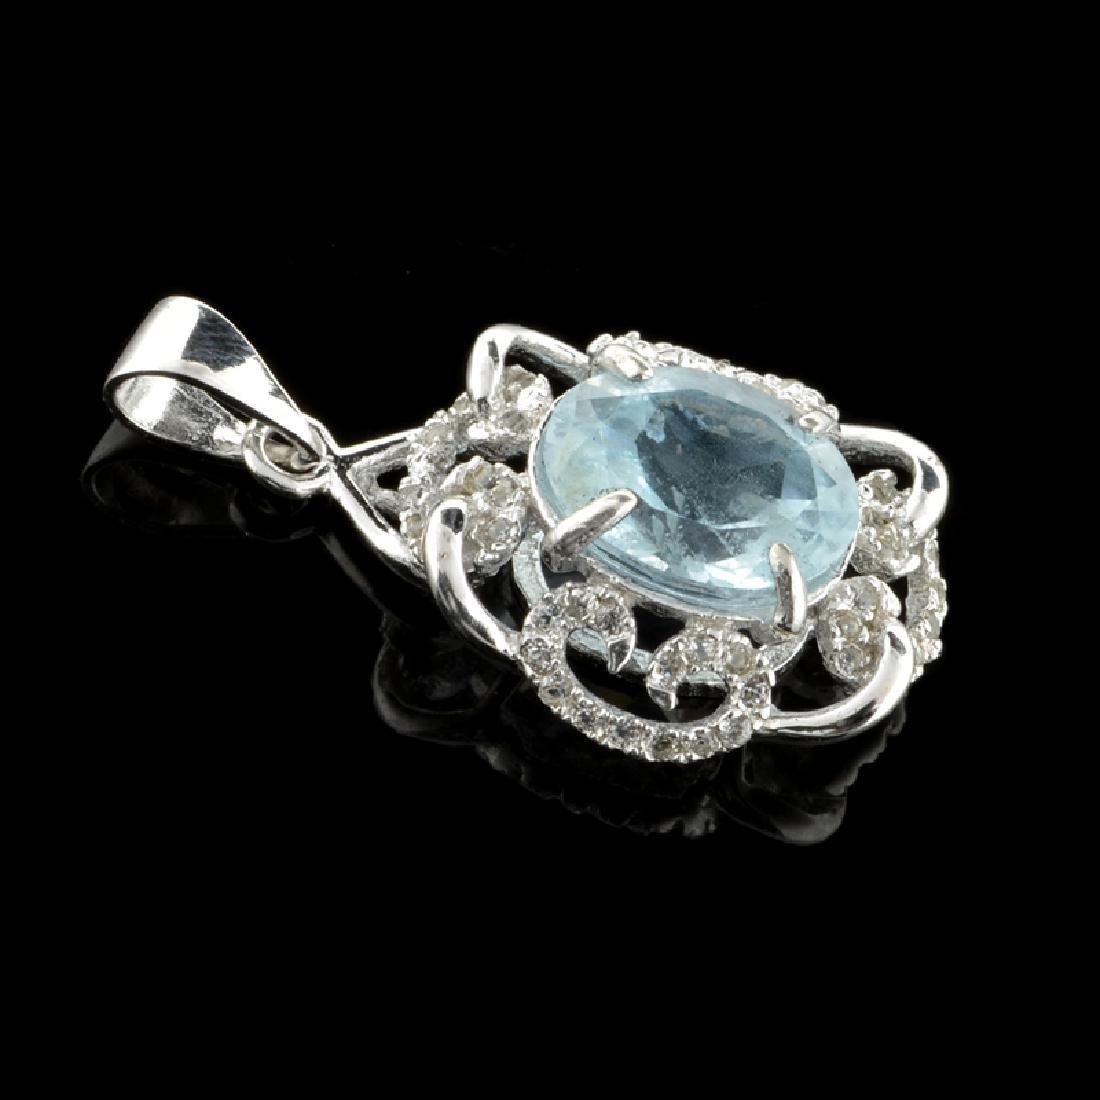 Fine Jewelry 2.34CT Aqua Marine Beryl And Colorless